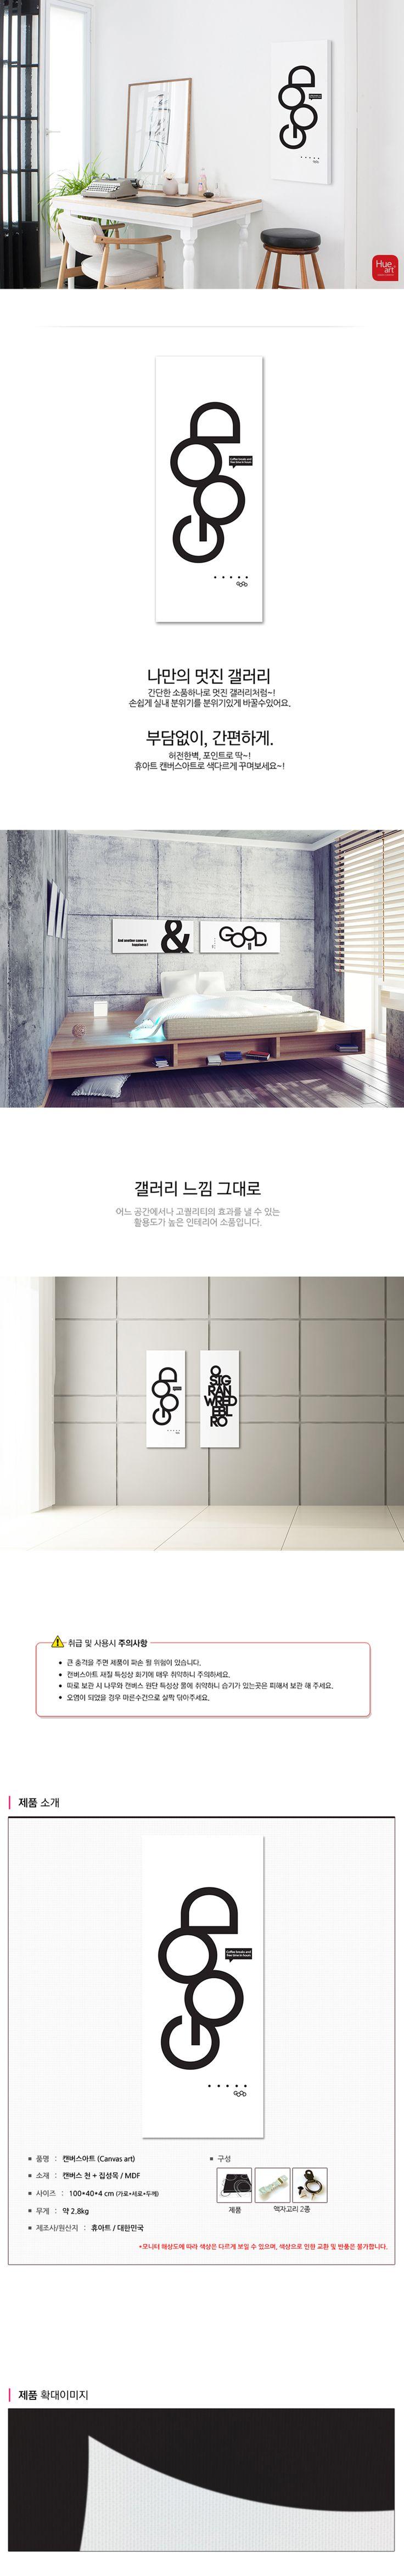 art-168 _Frame/design/art/interior/wall decoration/typography/타이포그래피/레터링/인테리어/일러스트/디자인/액자인테리어